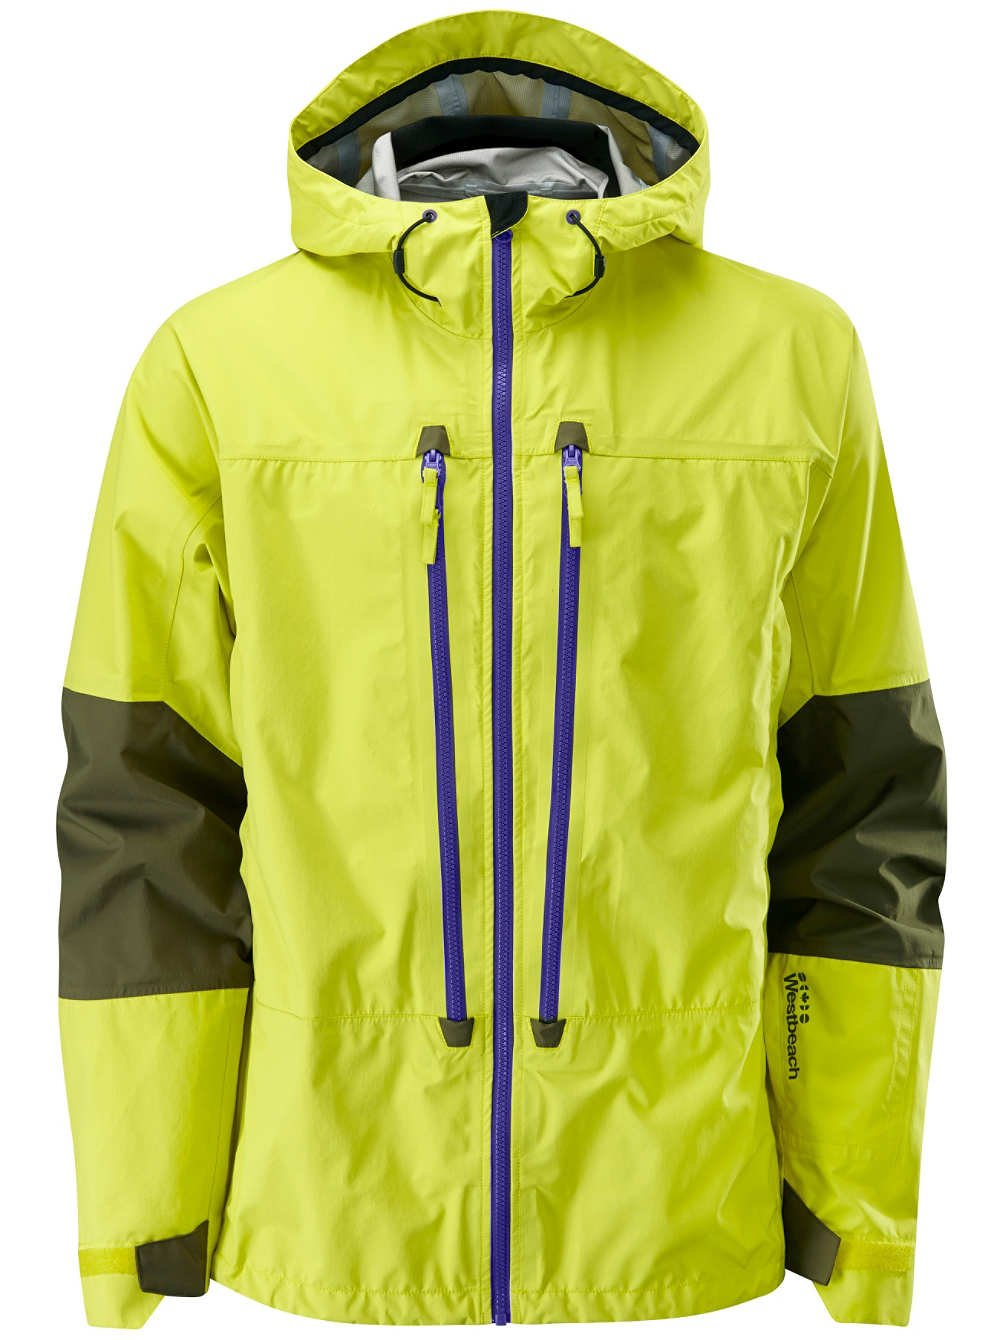 Westbeach Ego - Chaqueta de snowboard Cove Jacket, color ...